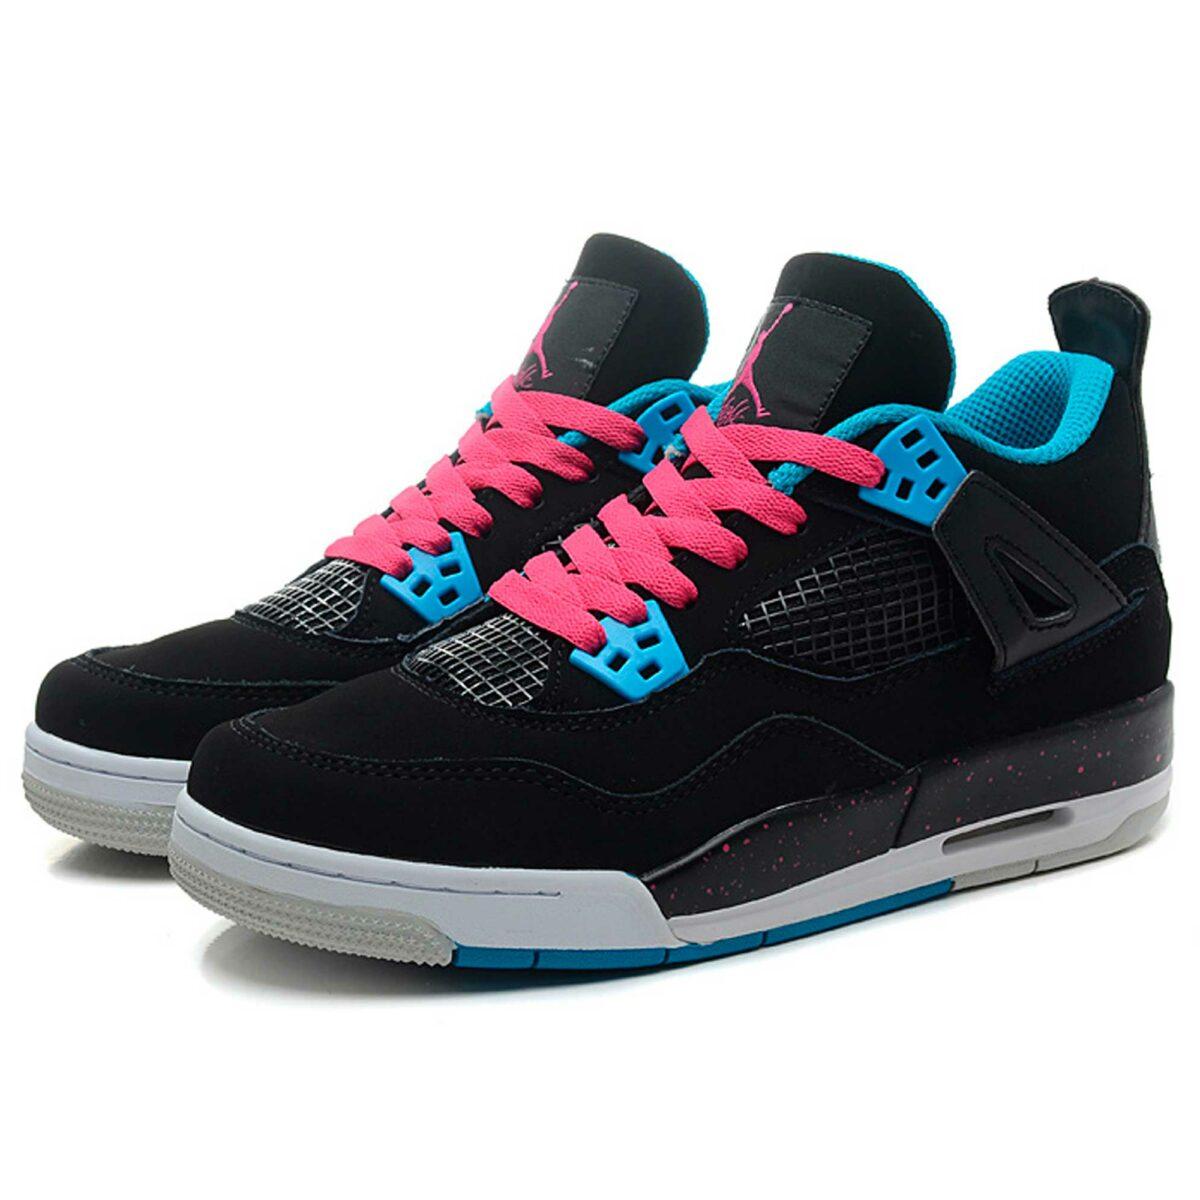 nike air jordan 4 retro black dynamic blue pink 487724-019 купить